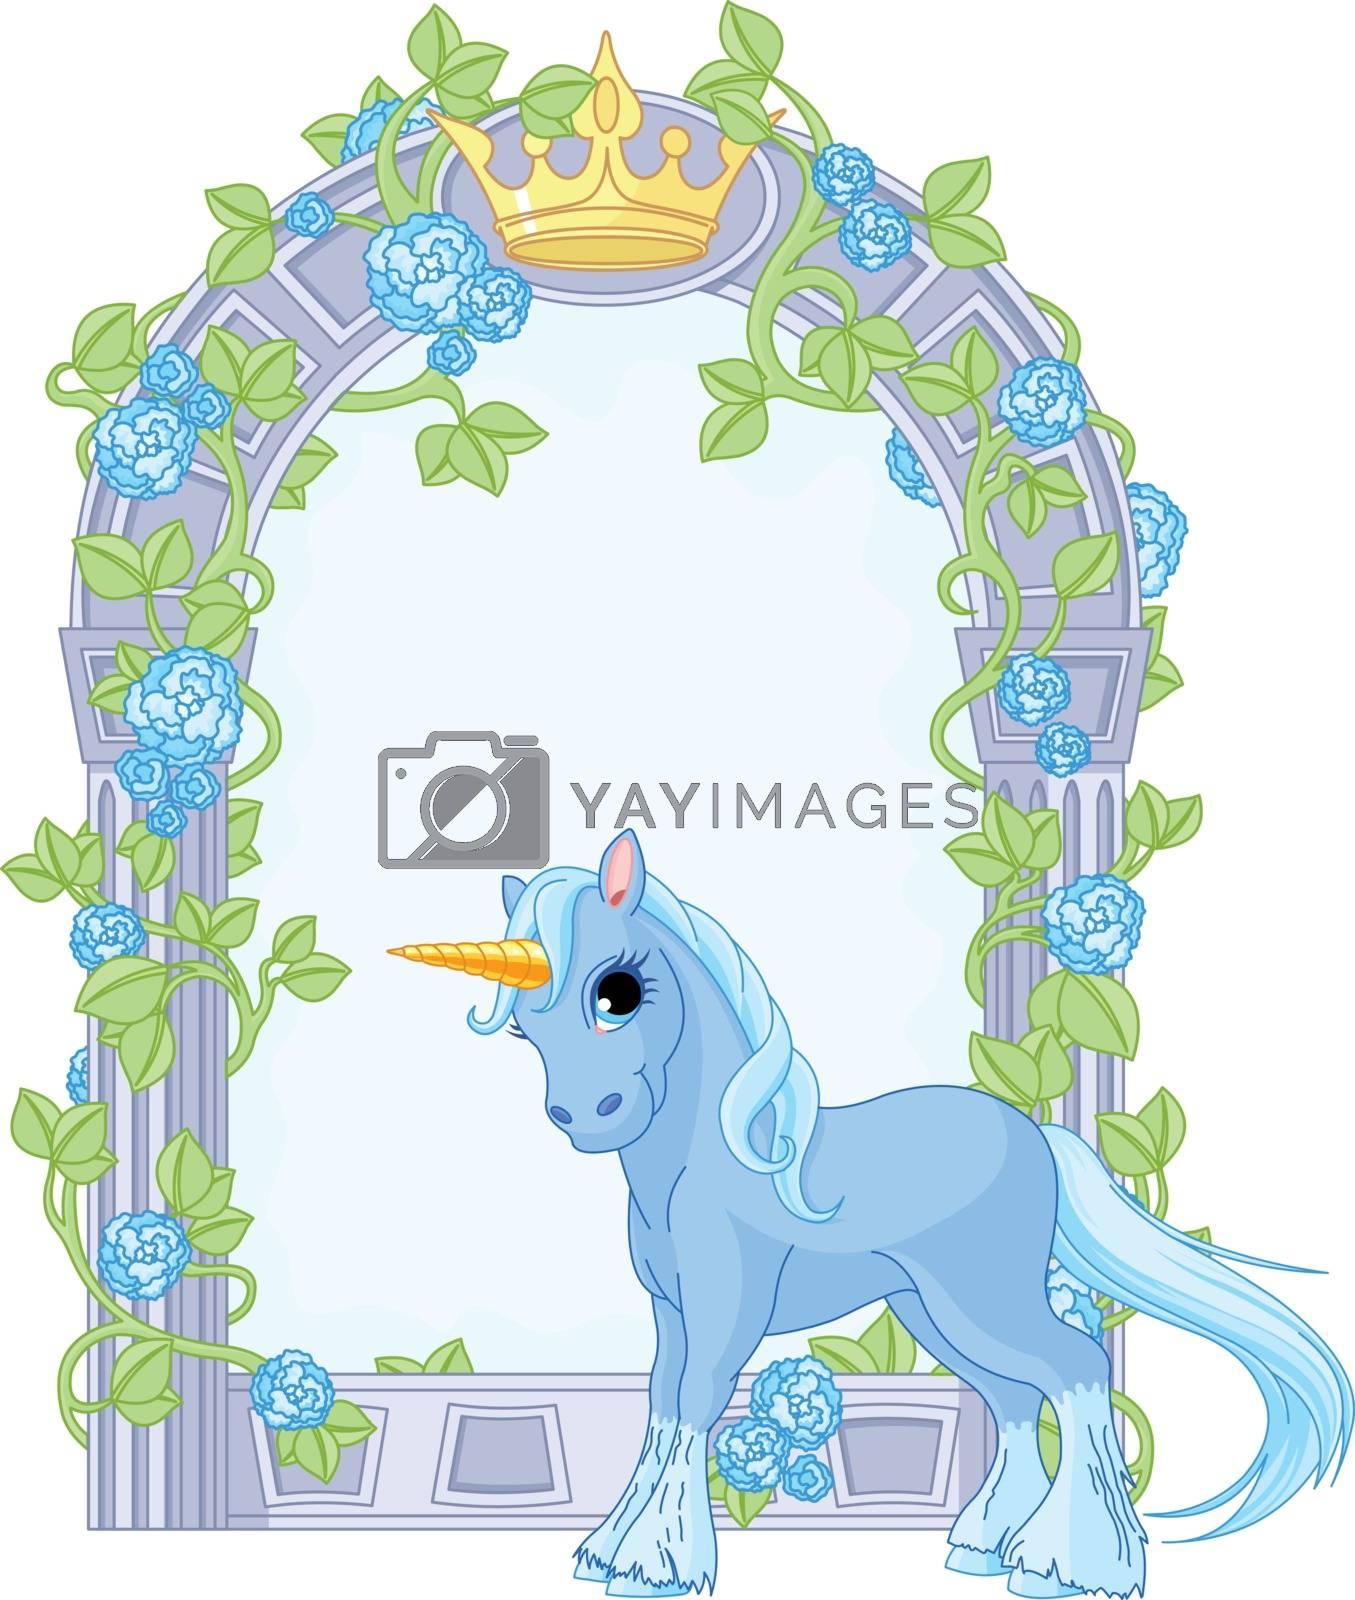 Royalty free image of Unicorn close to flower frame by Dazdraperma